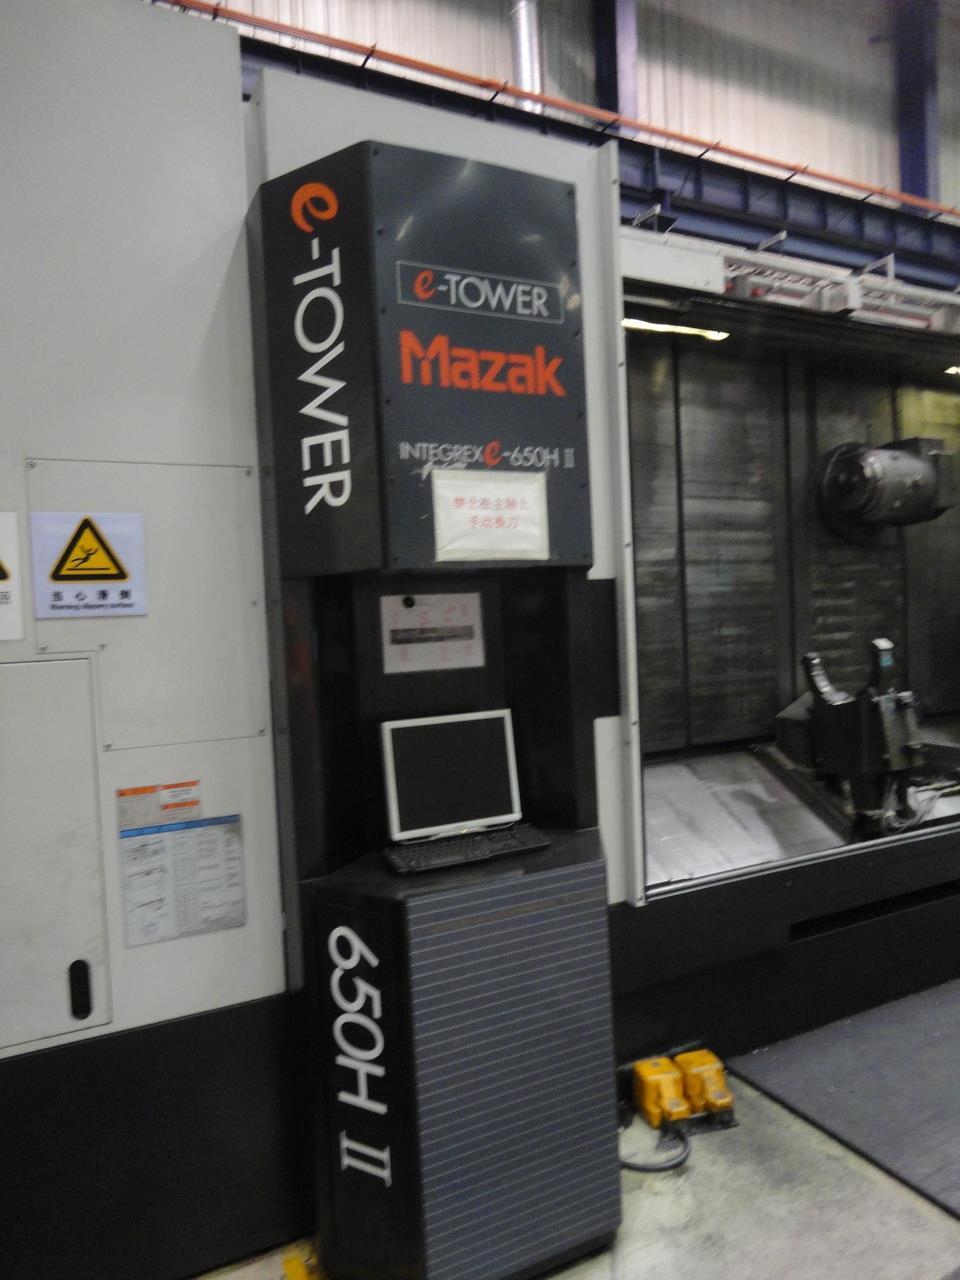 MAZAK INTEGREX E-650H-S | CNC Lathe- Milling Center | Second-hand